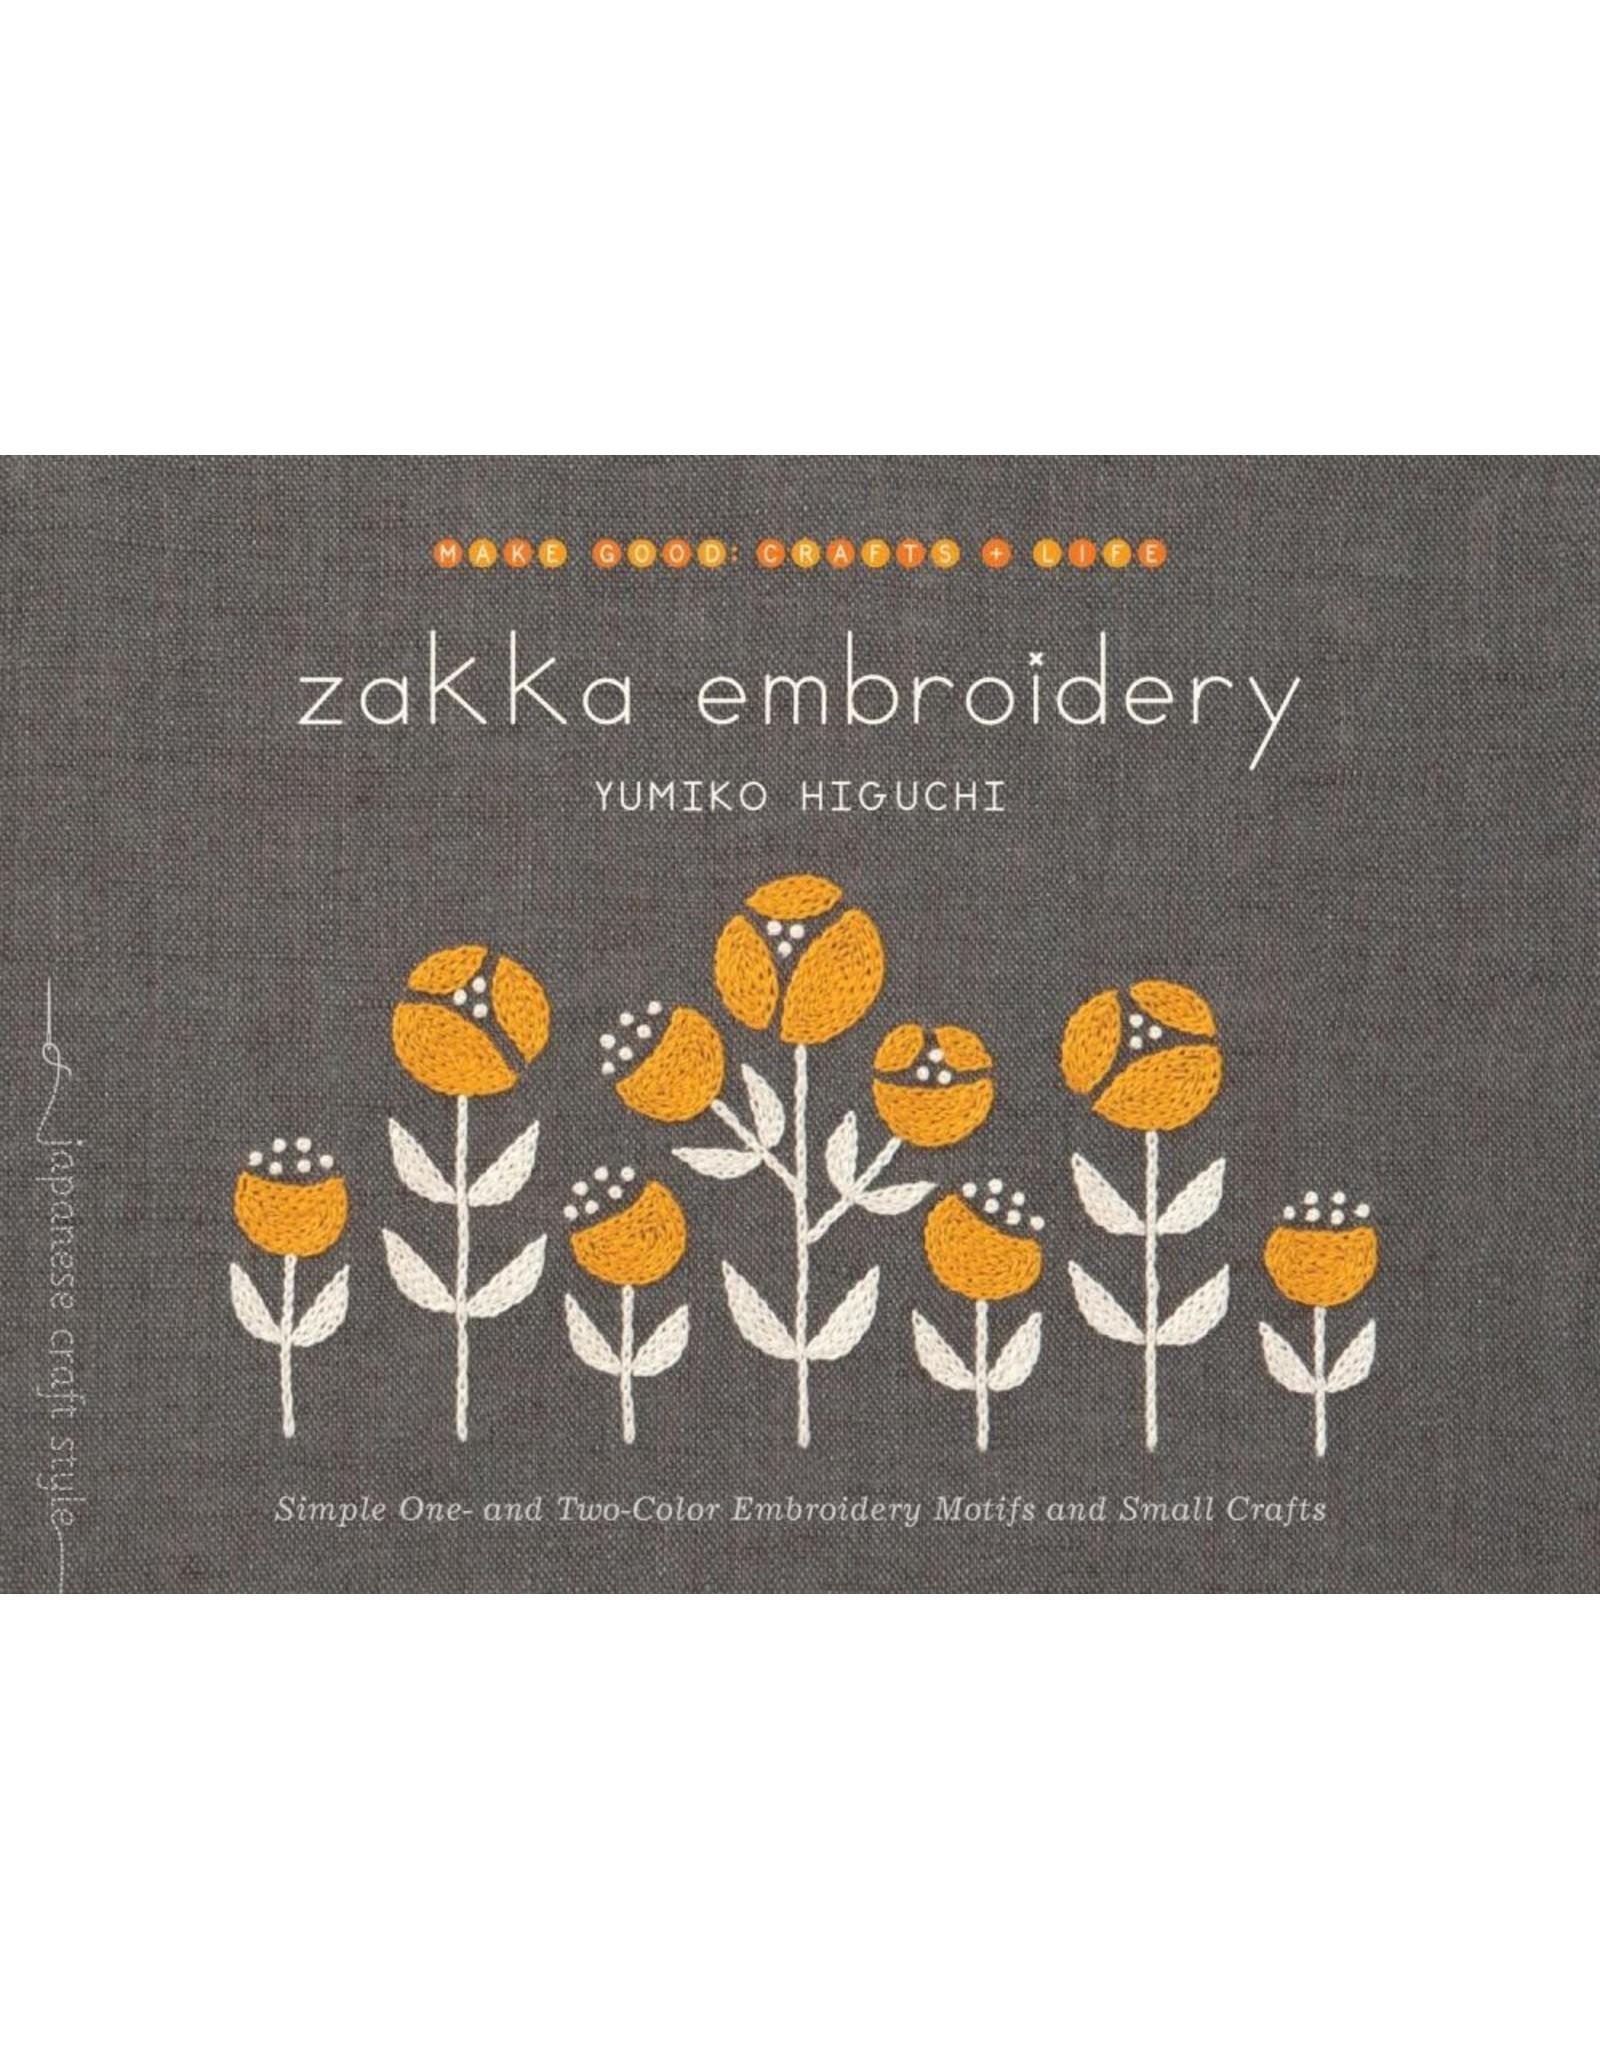 Yumiko Higuchi Zakka Embroidery